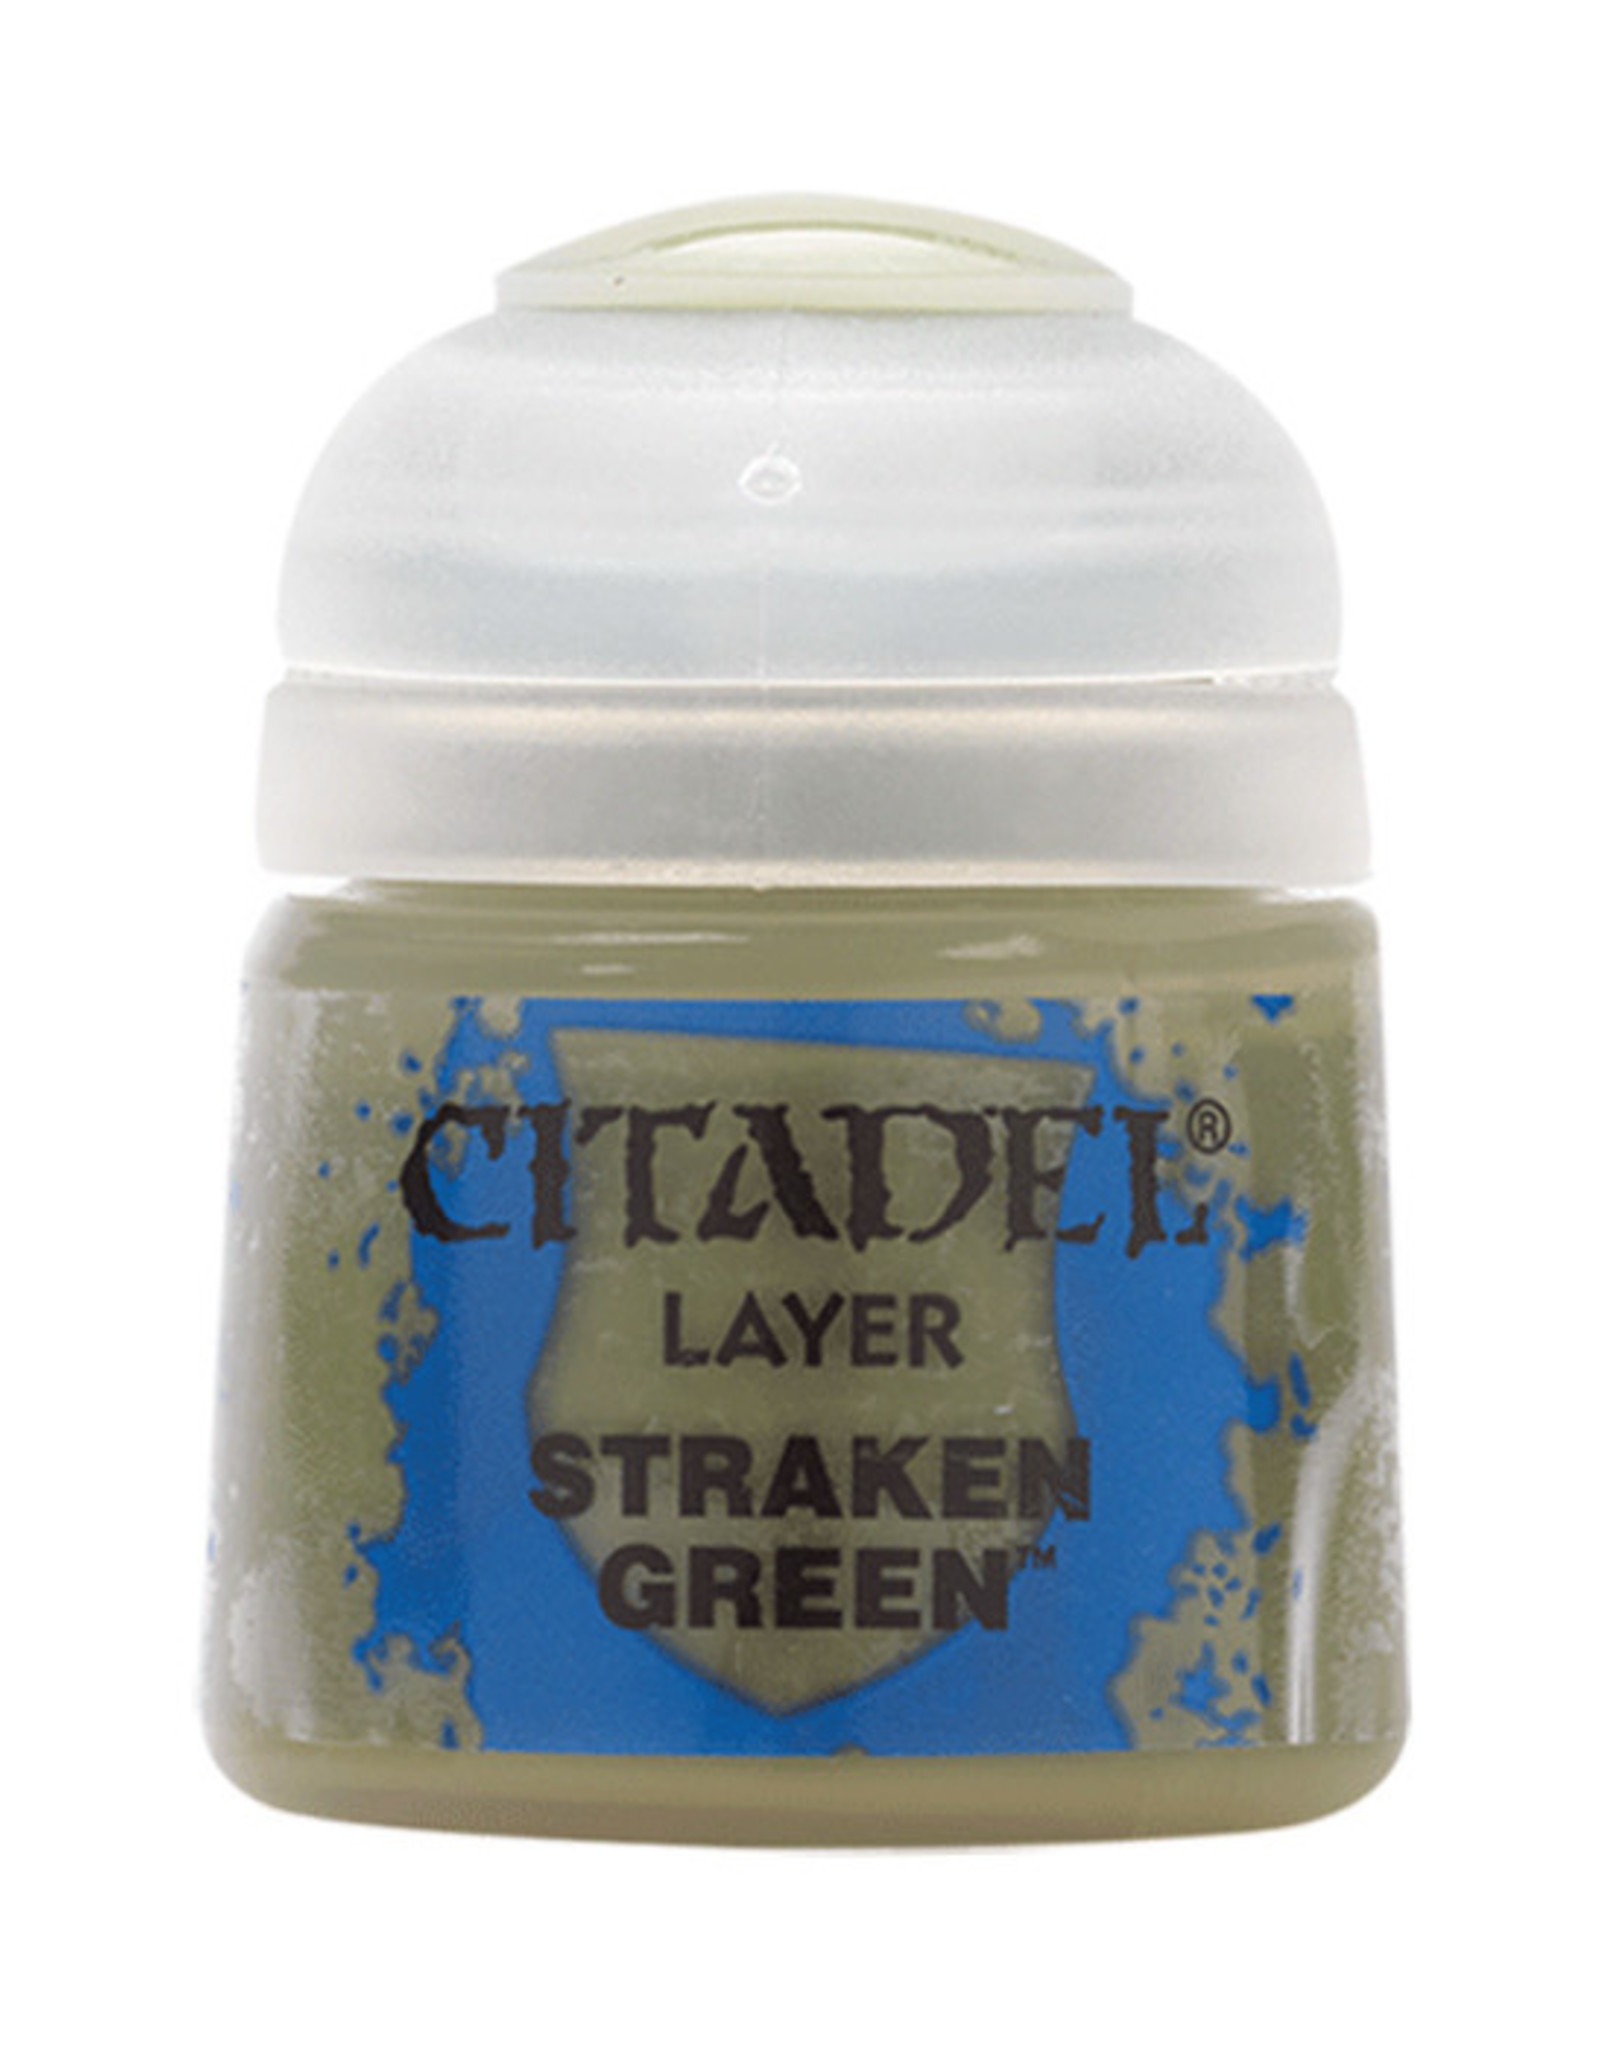 Citadel Citadel Colour: Layer - Straken Green